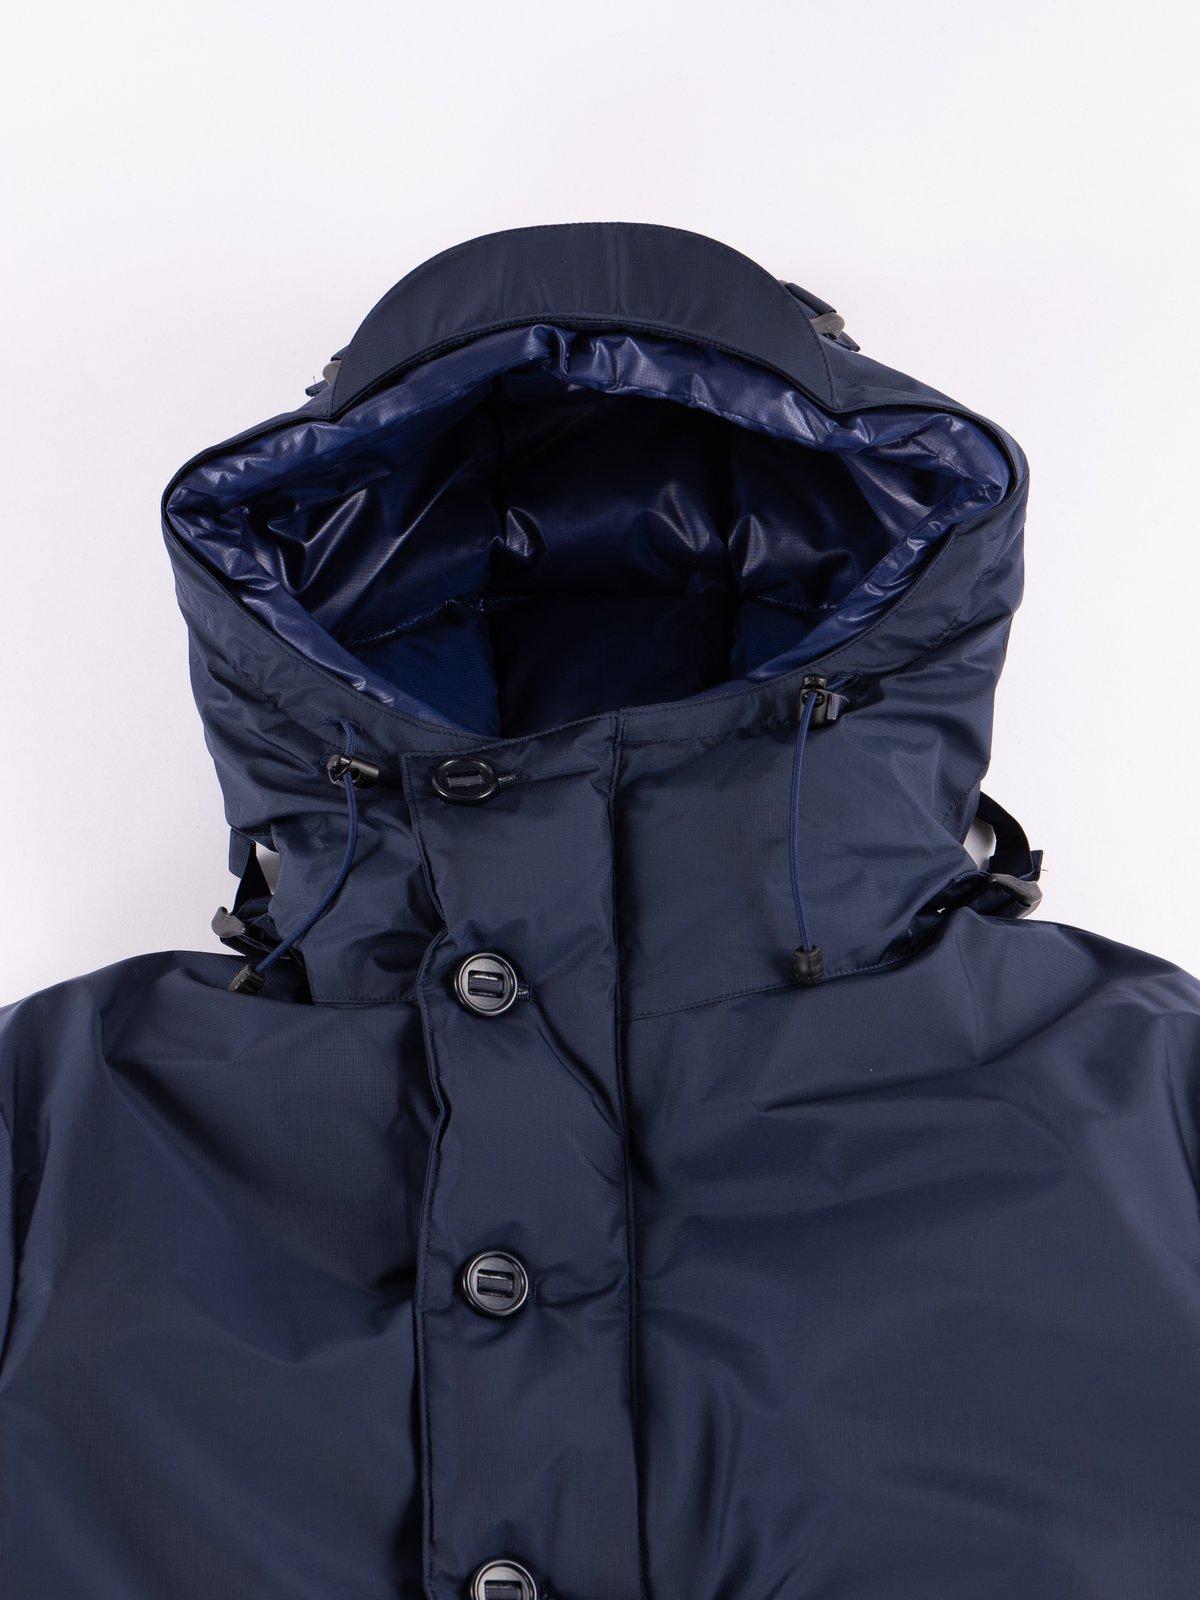 Navy/Blue Arktikal Down Jacket - Image 2